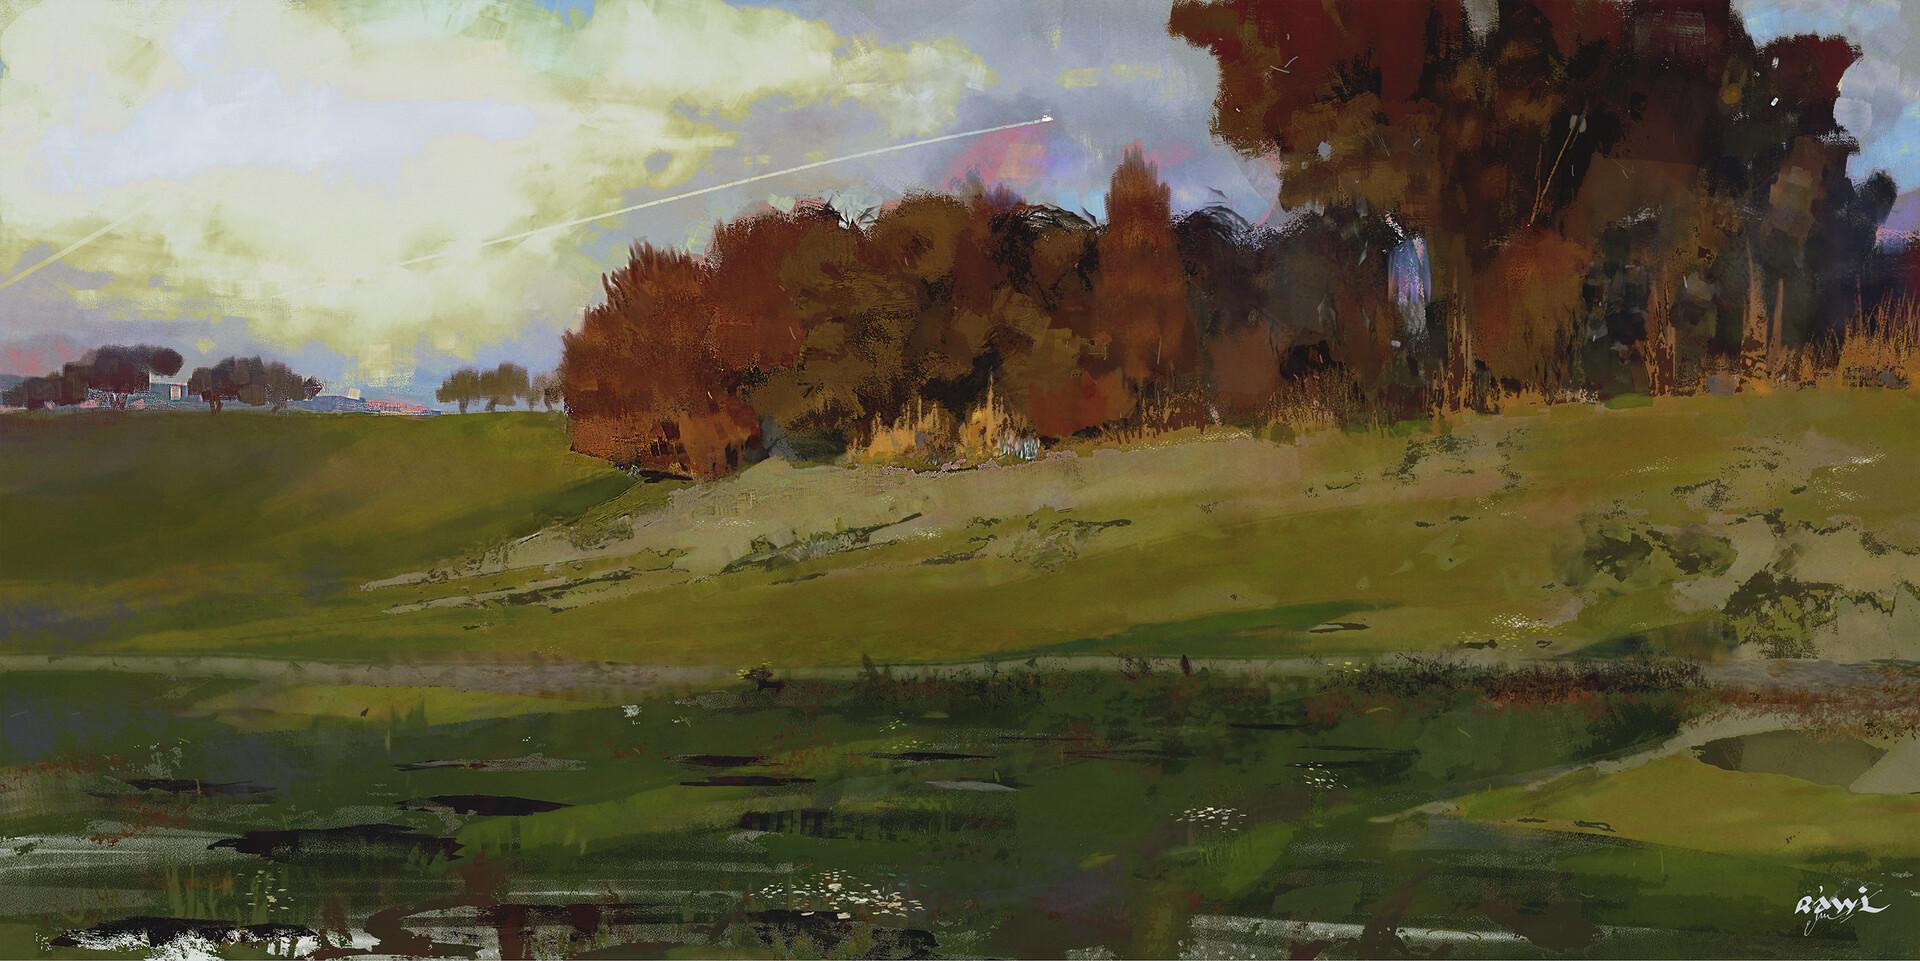 Ahmed rawi landscape study 1